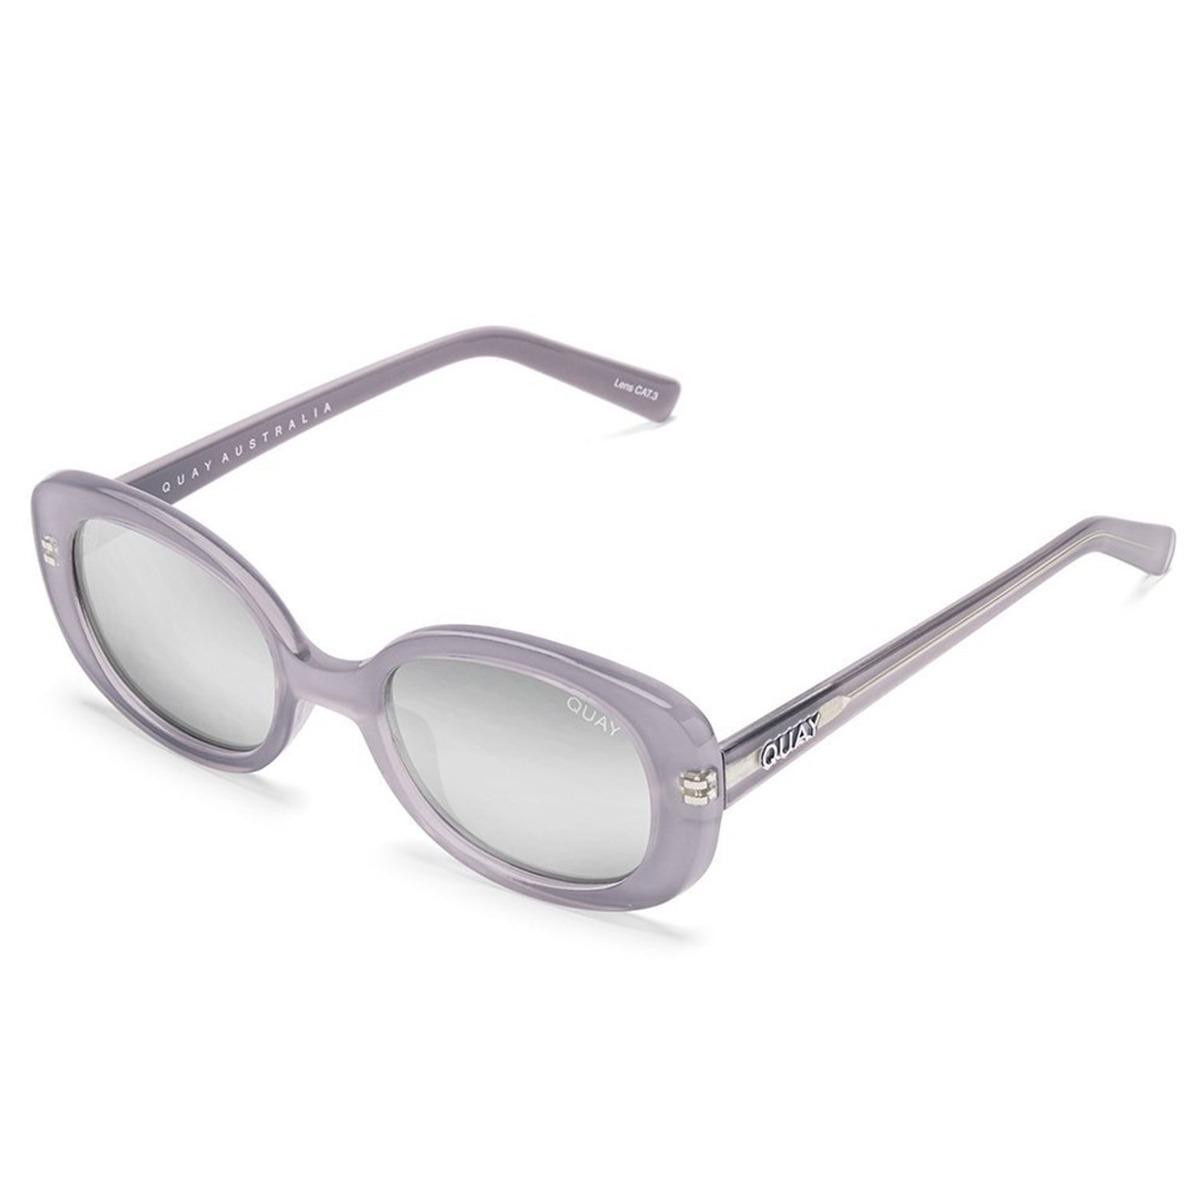 Gafas De Sol Del Marco Grueso Oval Mini Muelle De Australia ...